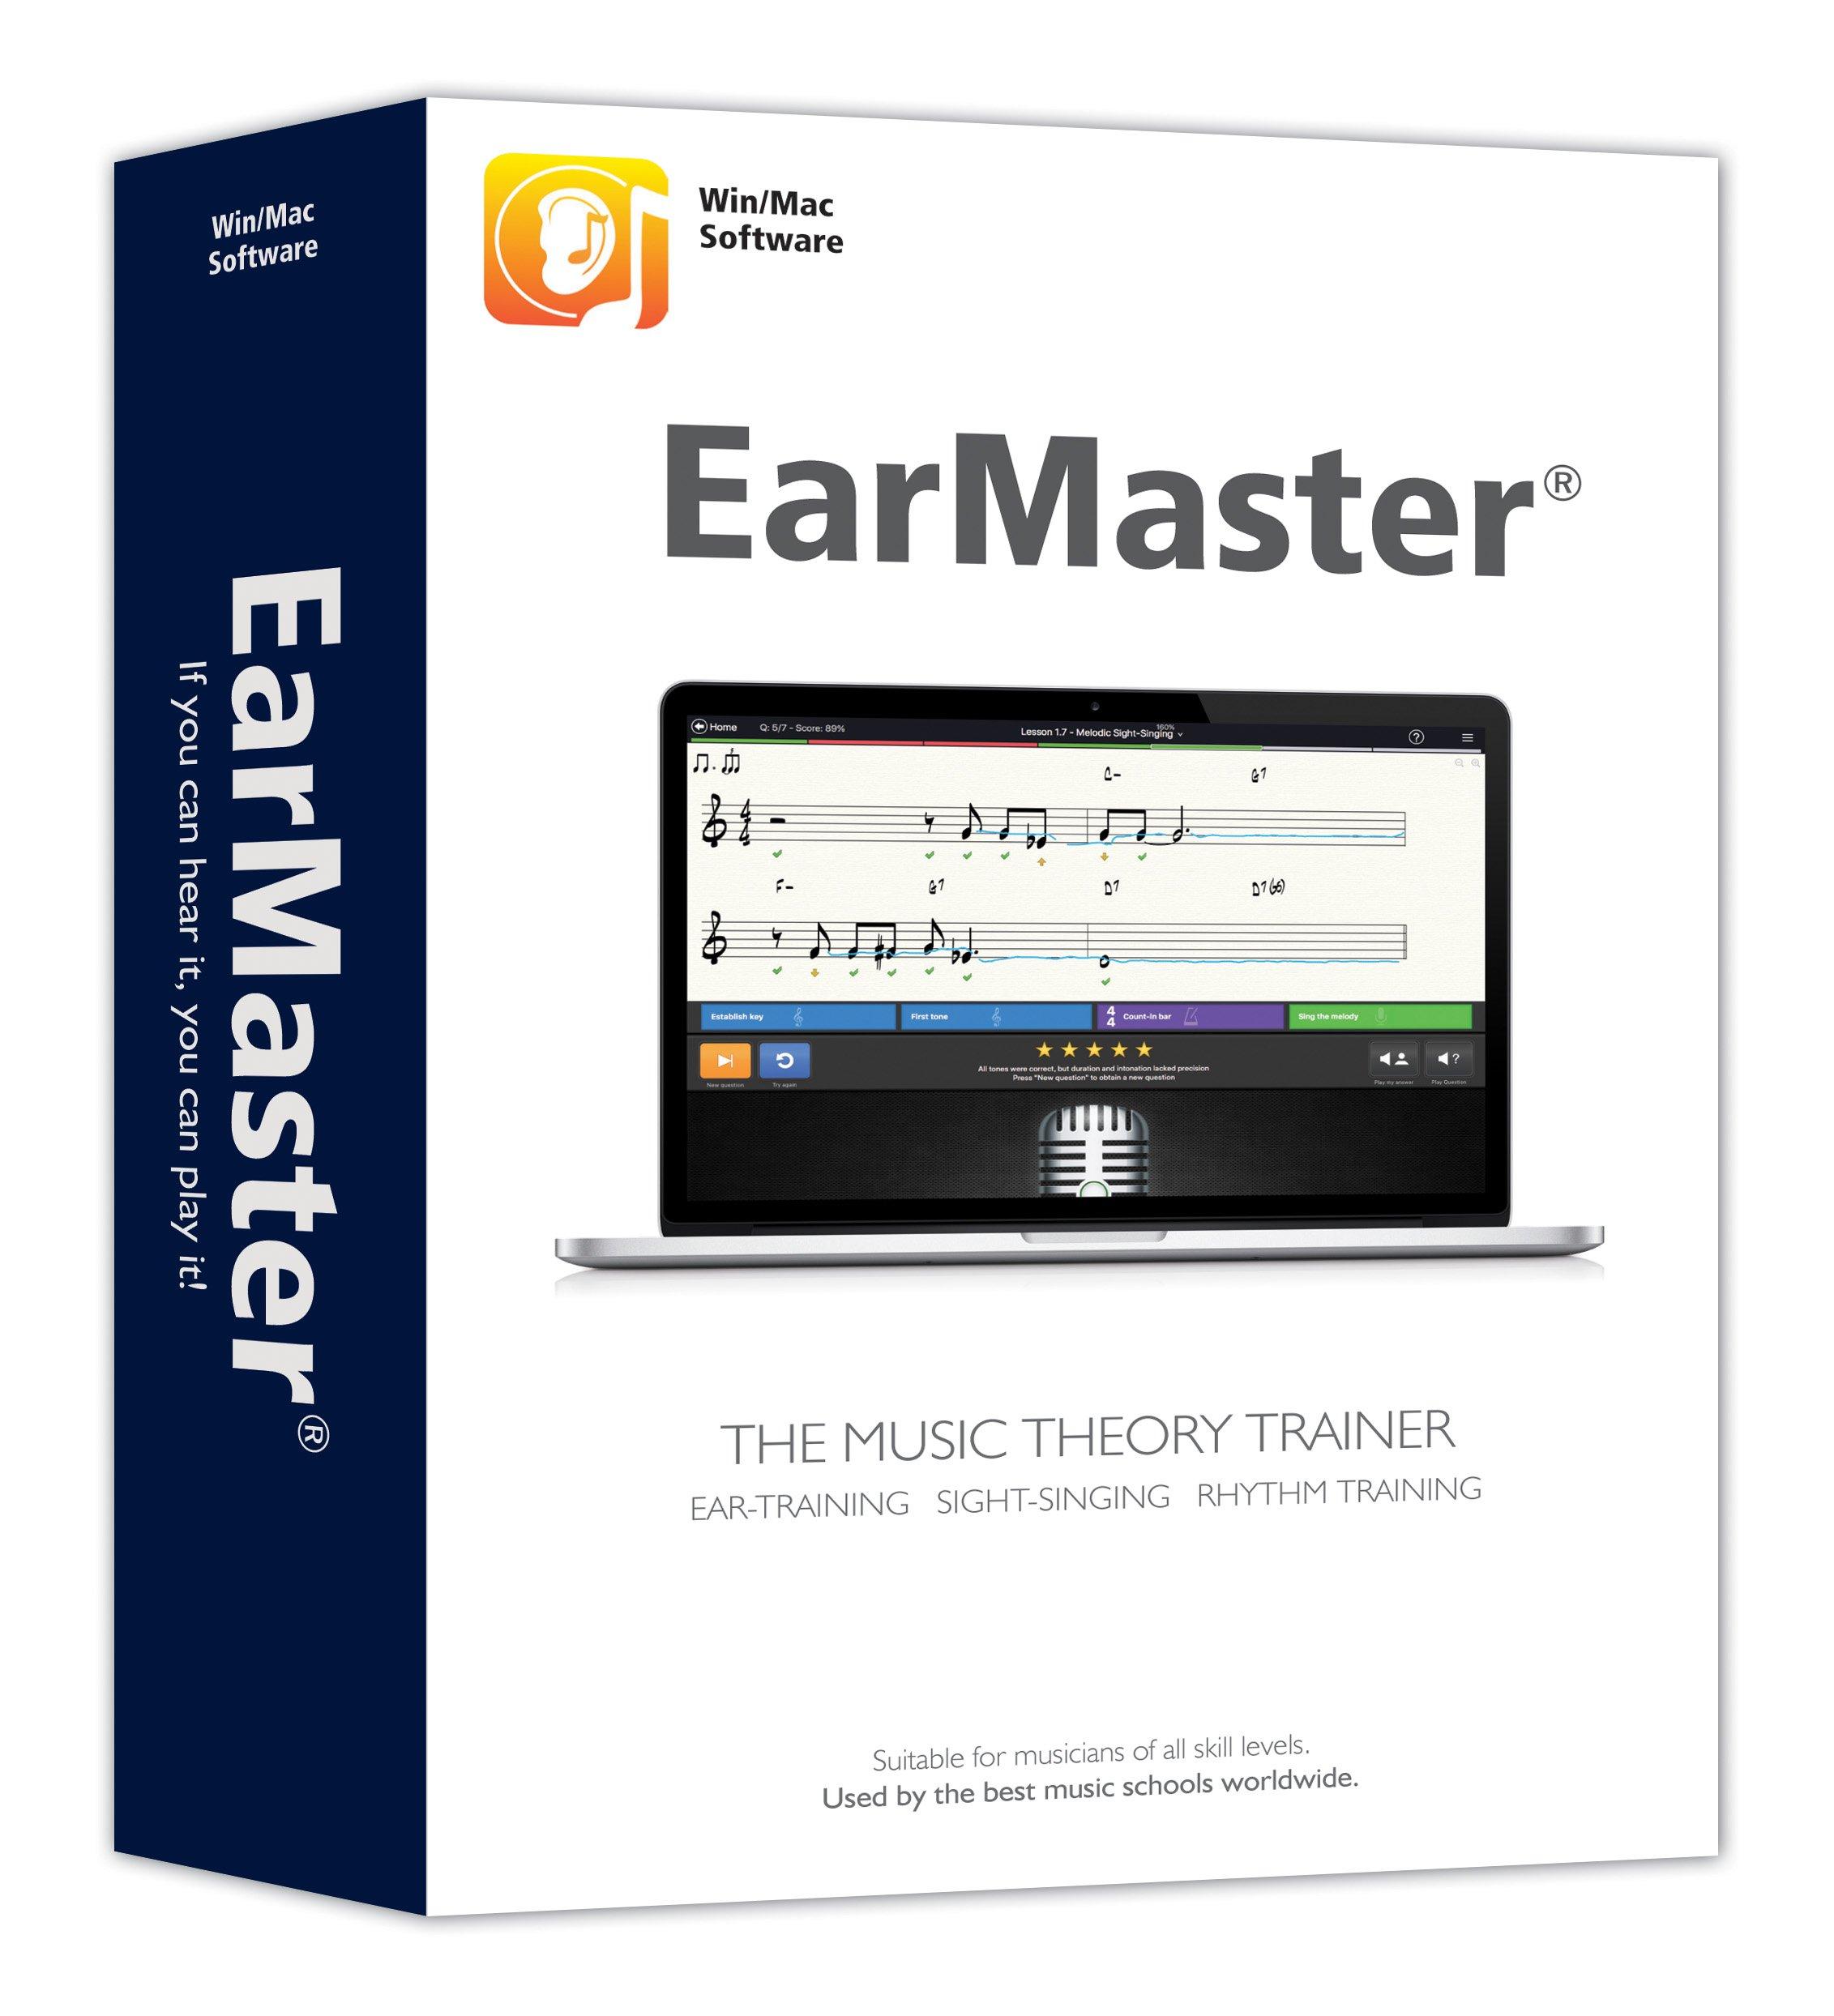 EarMaster 7 Professional - Ear Training, Sight-Singing, Rhythm Trainer by EarMaster ApS